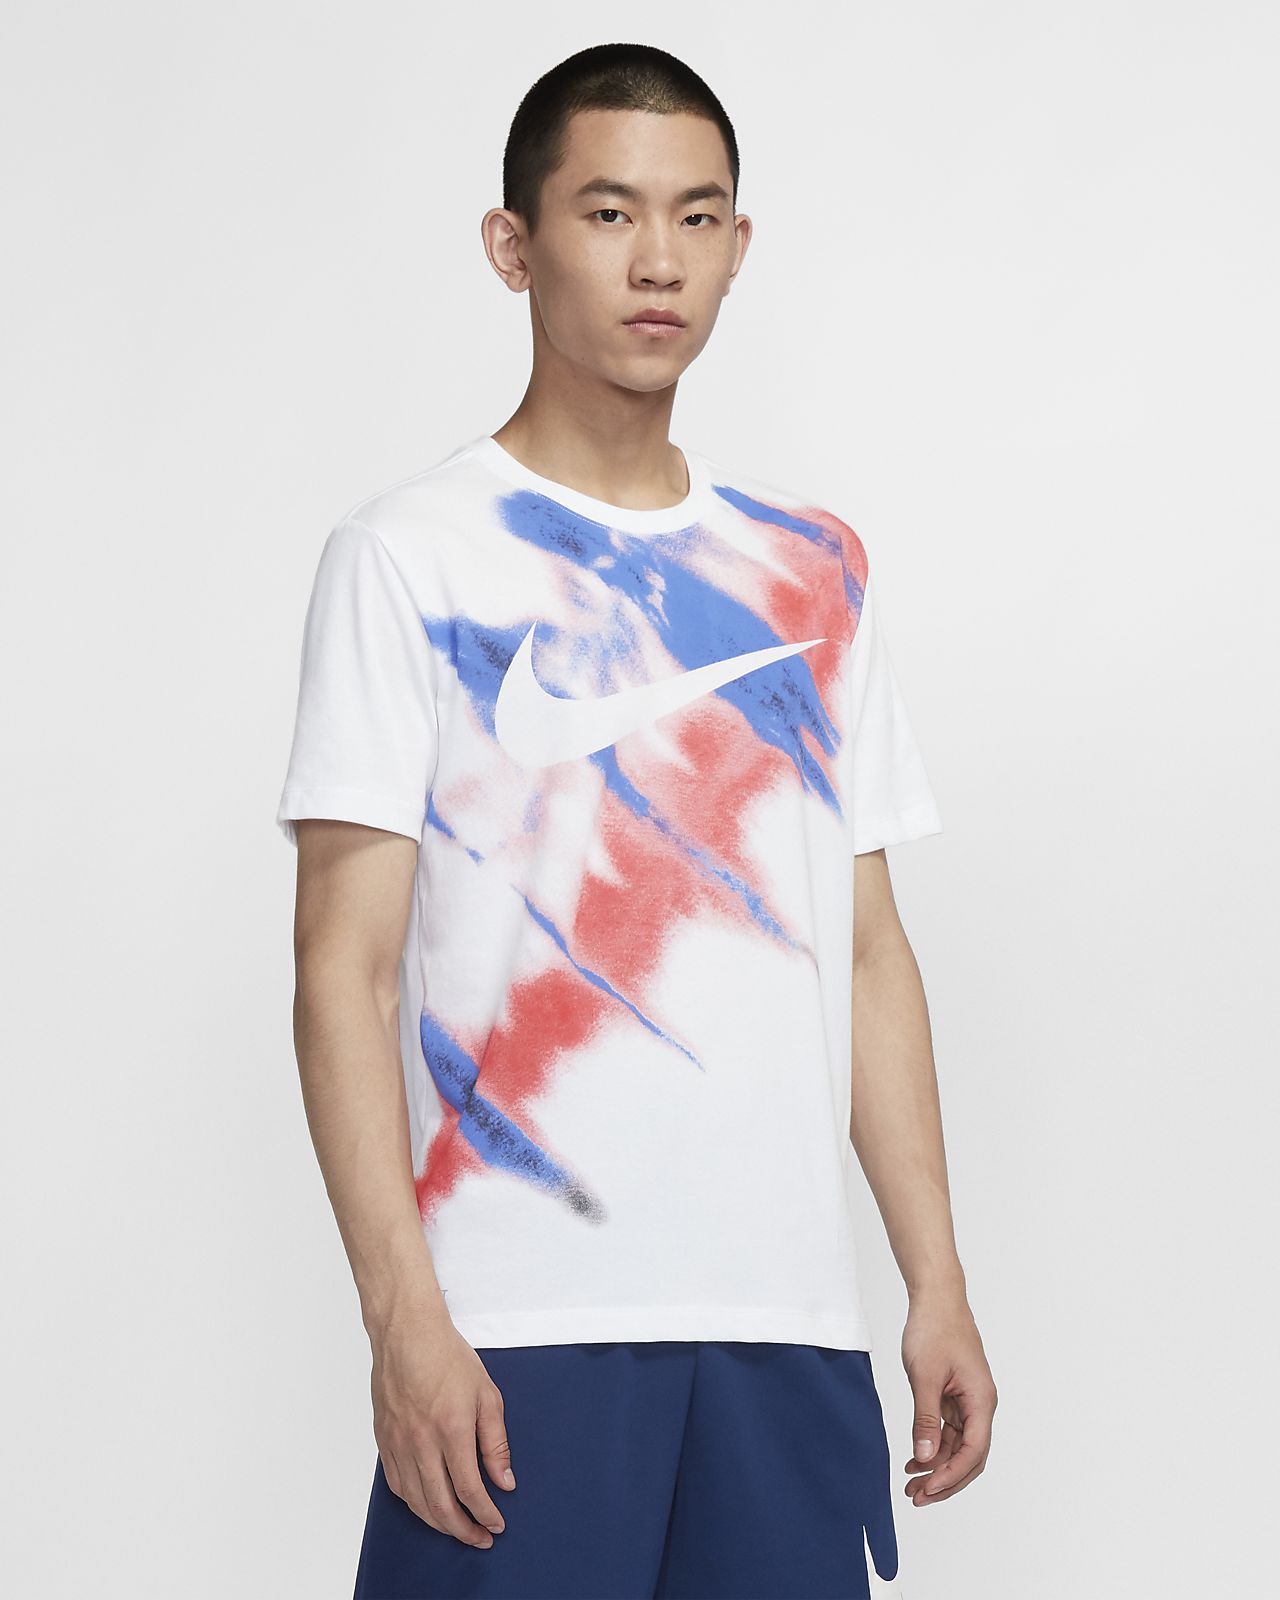 Nike Dri-FIT 男子短袖训练T恤